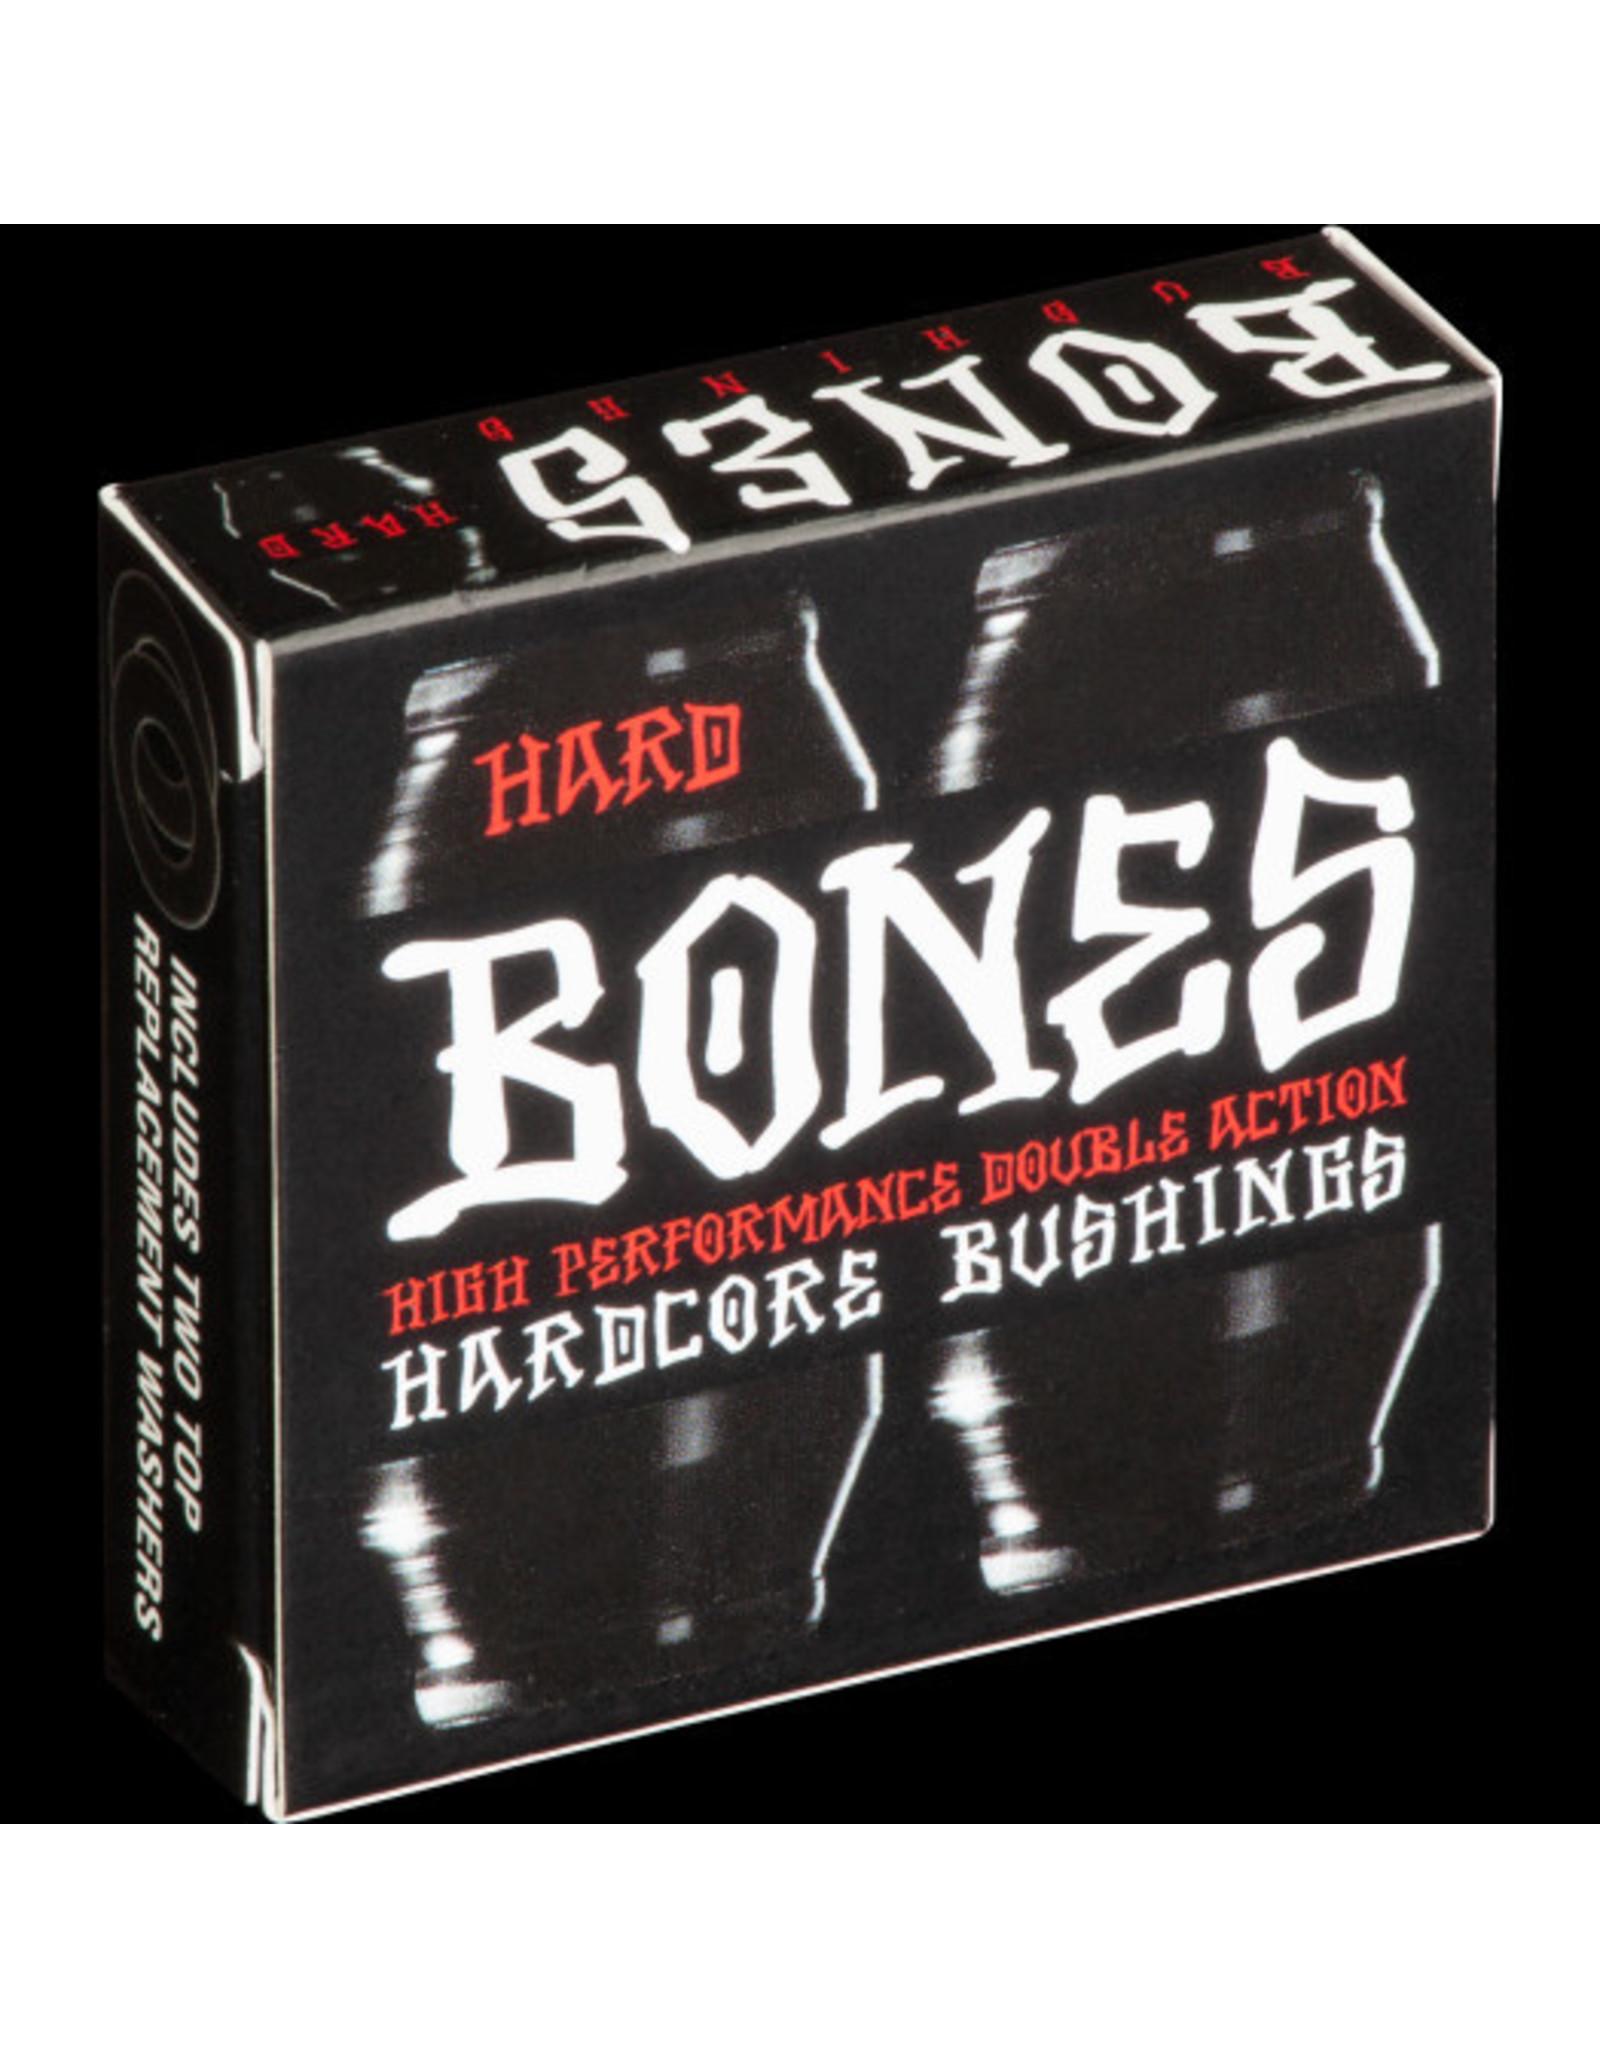 BONES BONES - BUSHINGS HARD